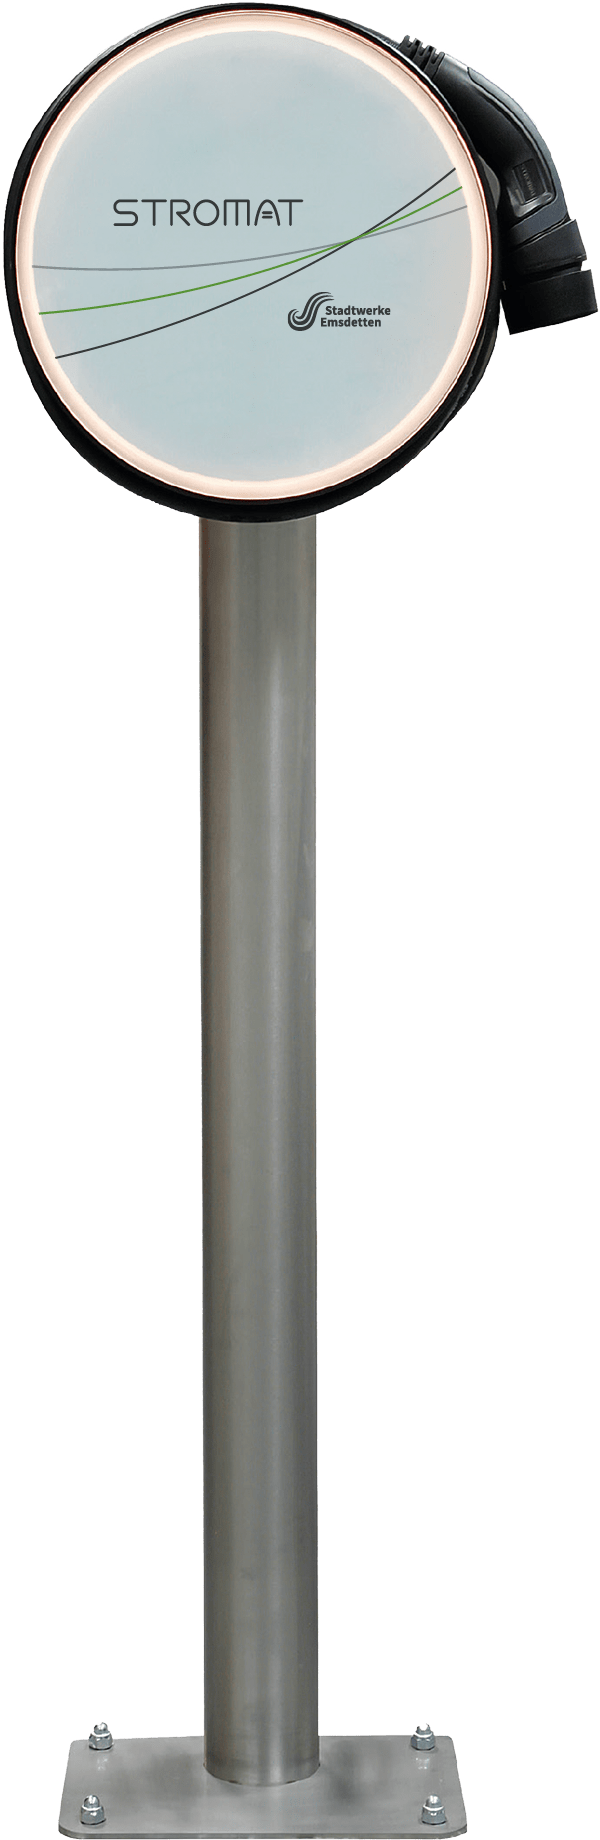 Stromat_Standfuß